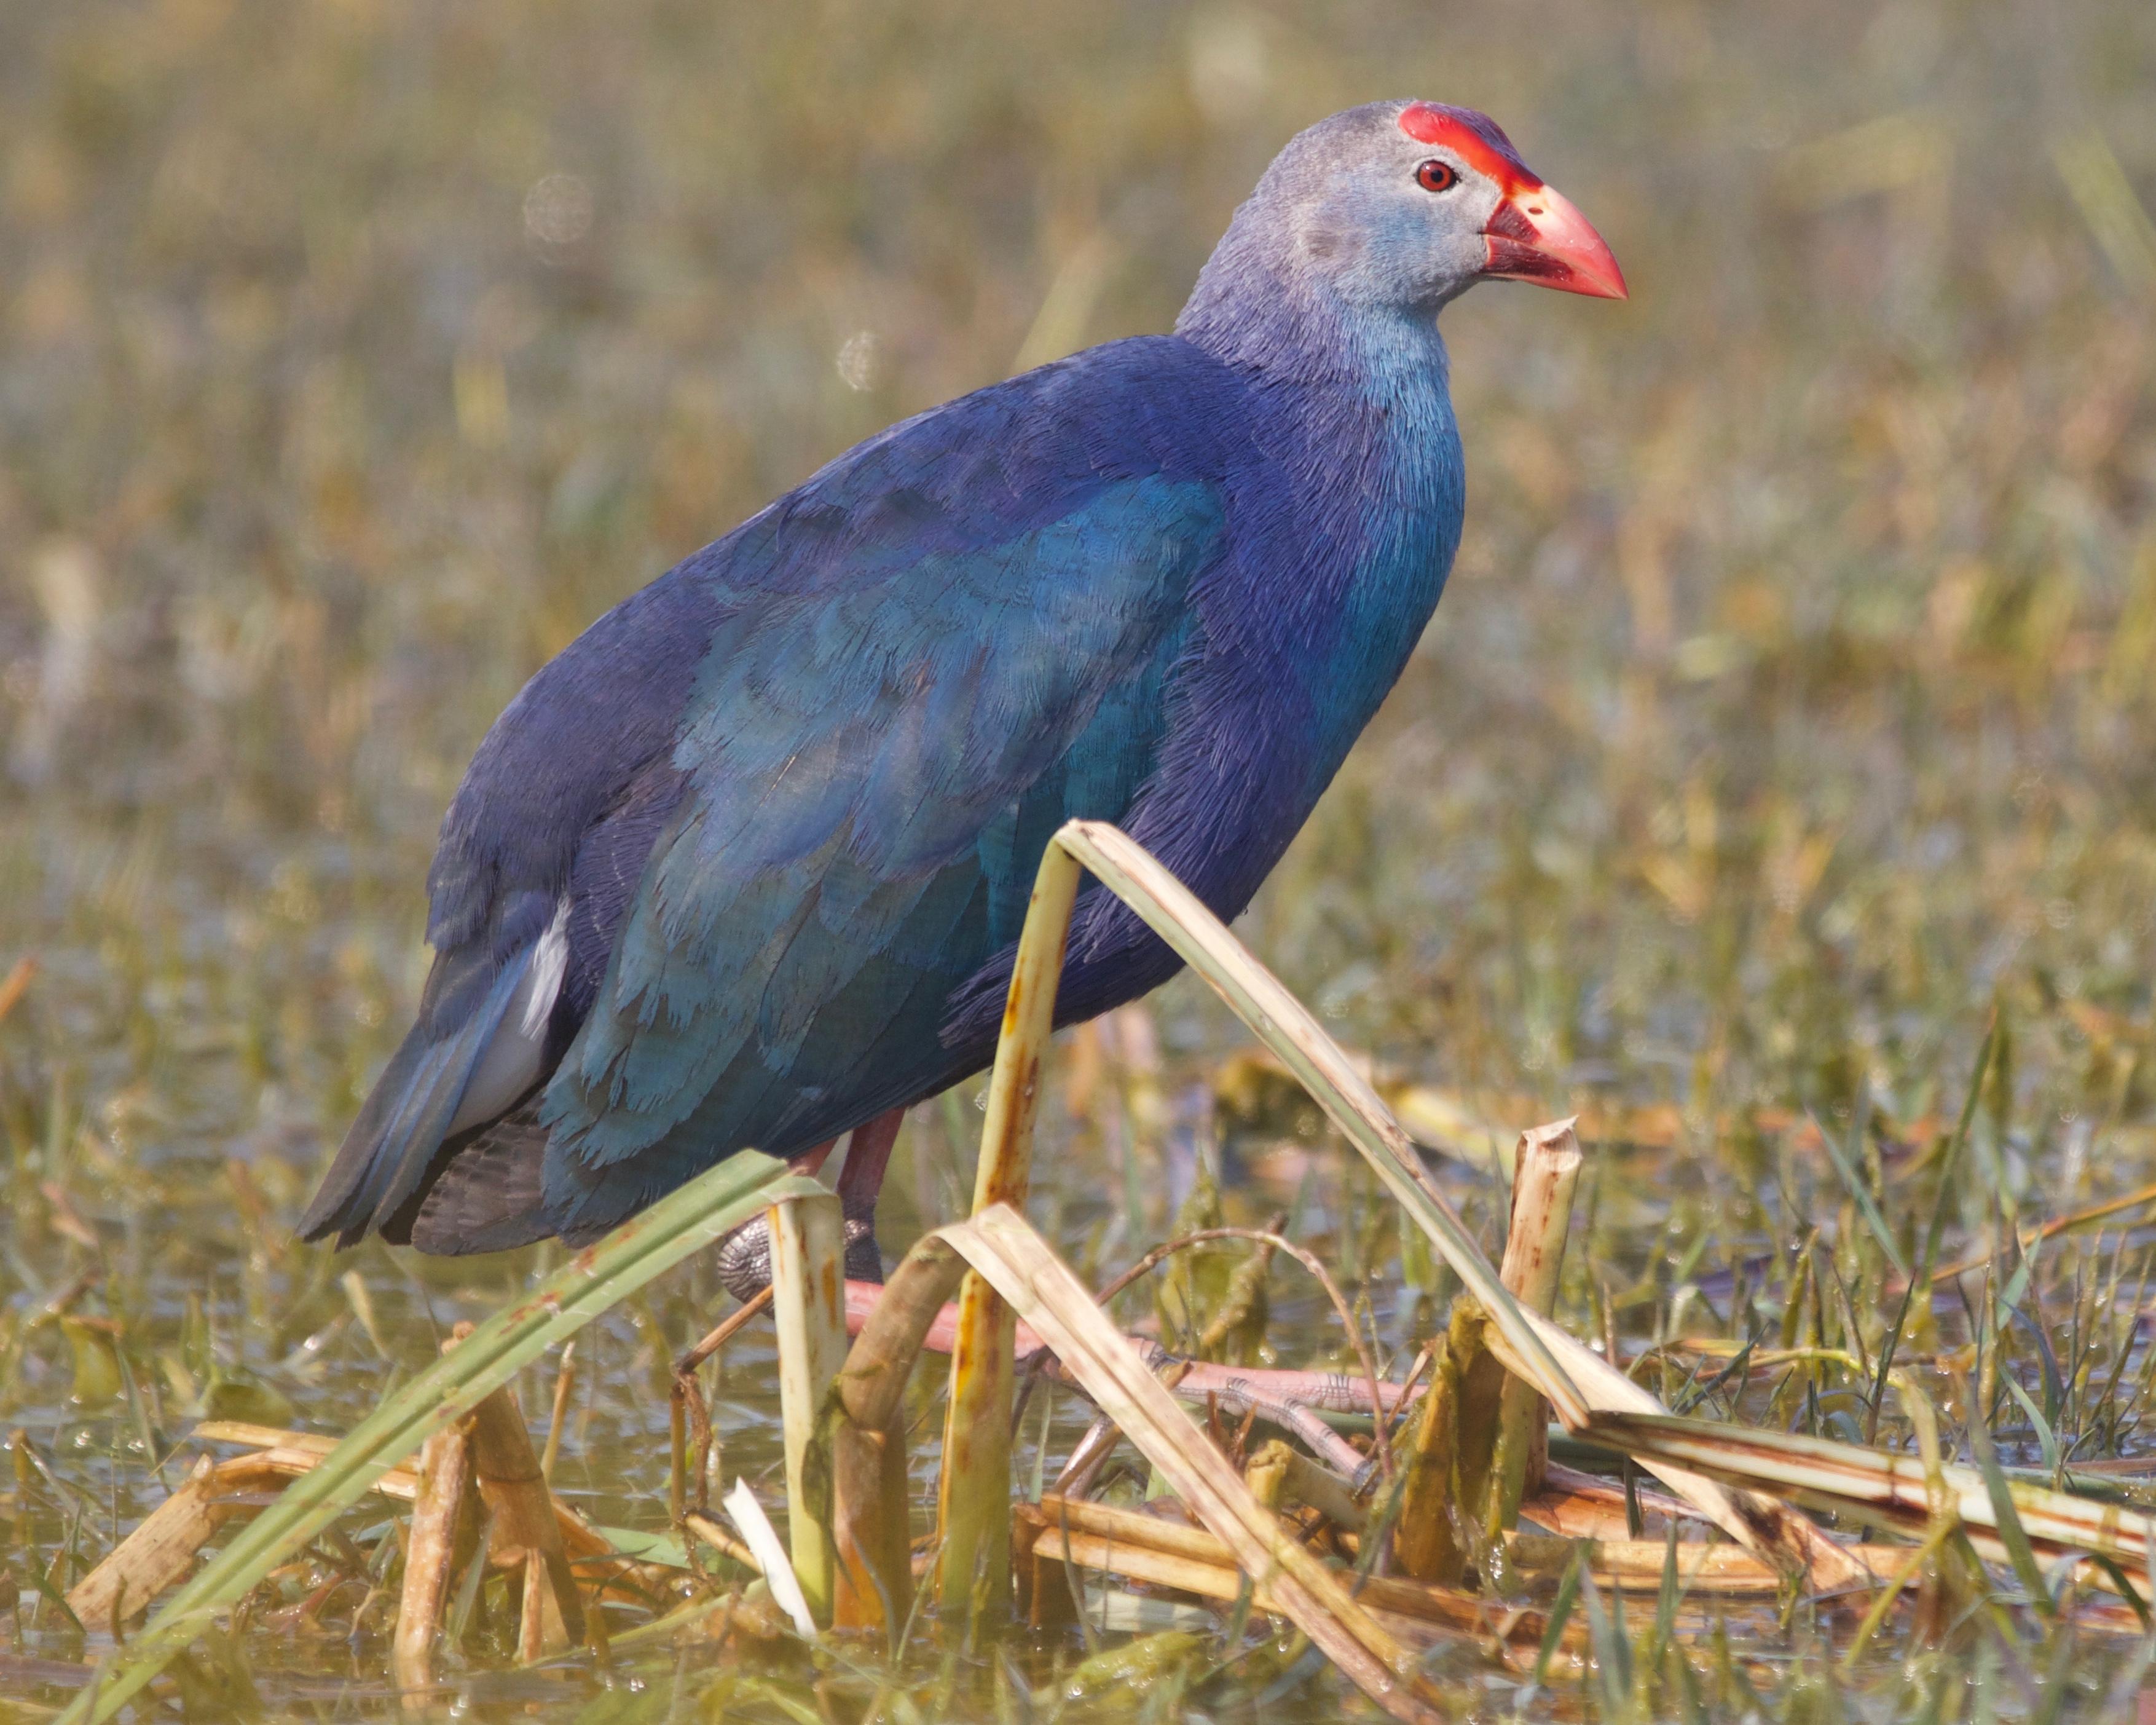 Lipstick bird.jpg English: Migratory season at Keoladeo National Park, Bharatpur, Rajasthan. Feb 2020. Date 10 February 2020, 09:57:15 Source